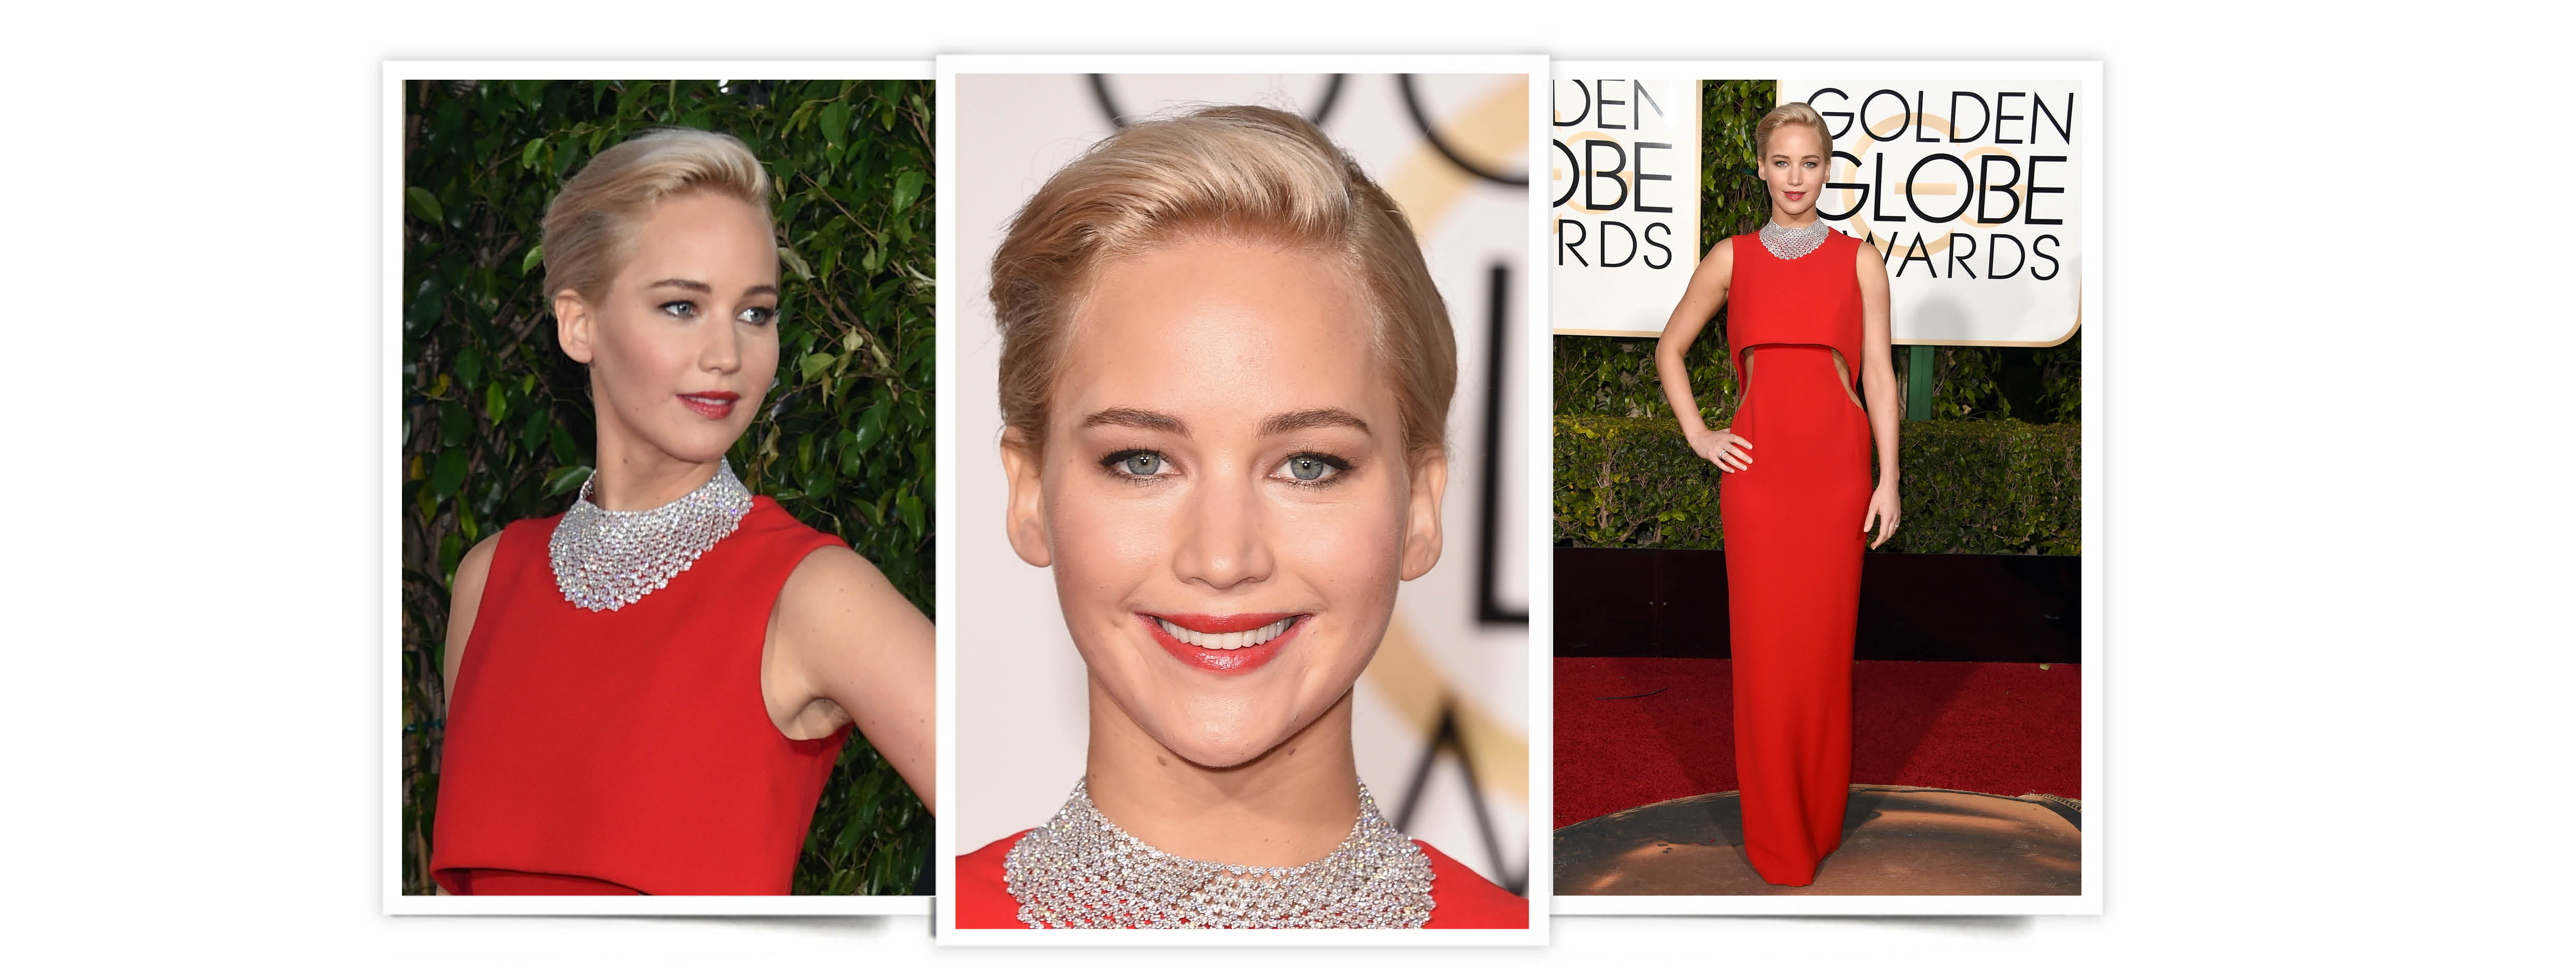 GLOBOS DE ORO. Jennifer Lawrence de Dior.